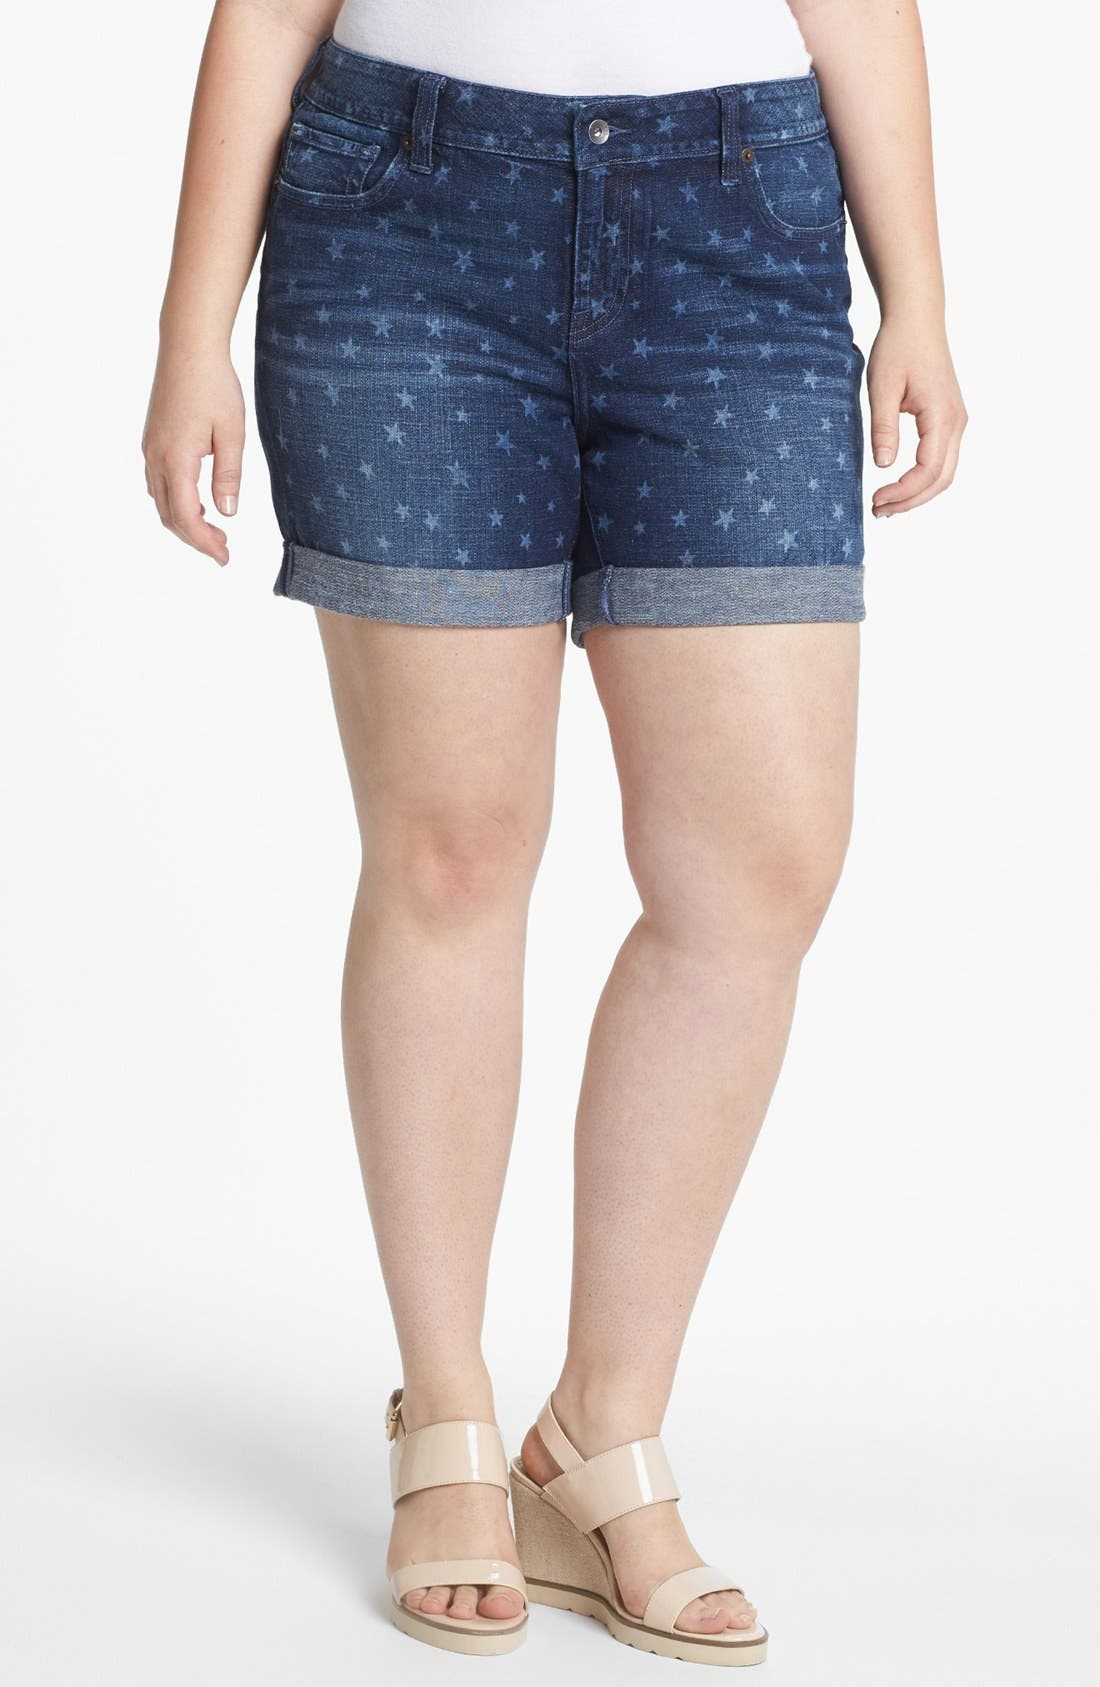 Alternate Image 1 Selected - Lucky Brand 'Americana' Denim Shorts (Plus Size)